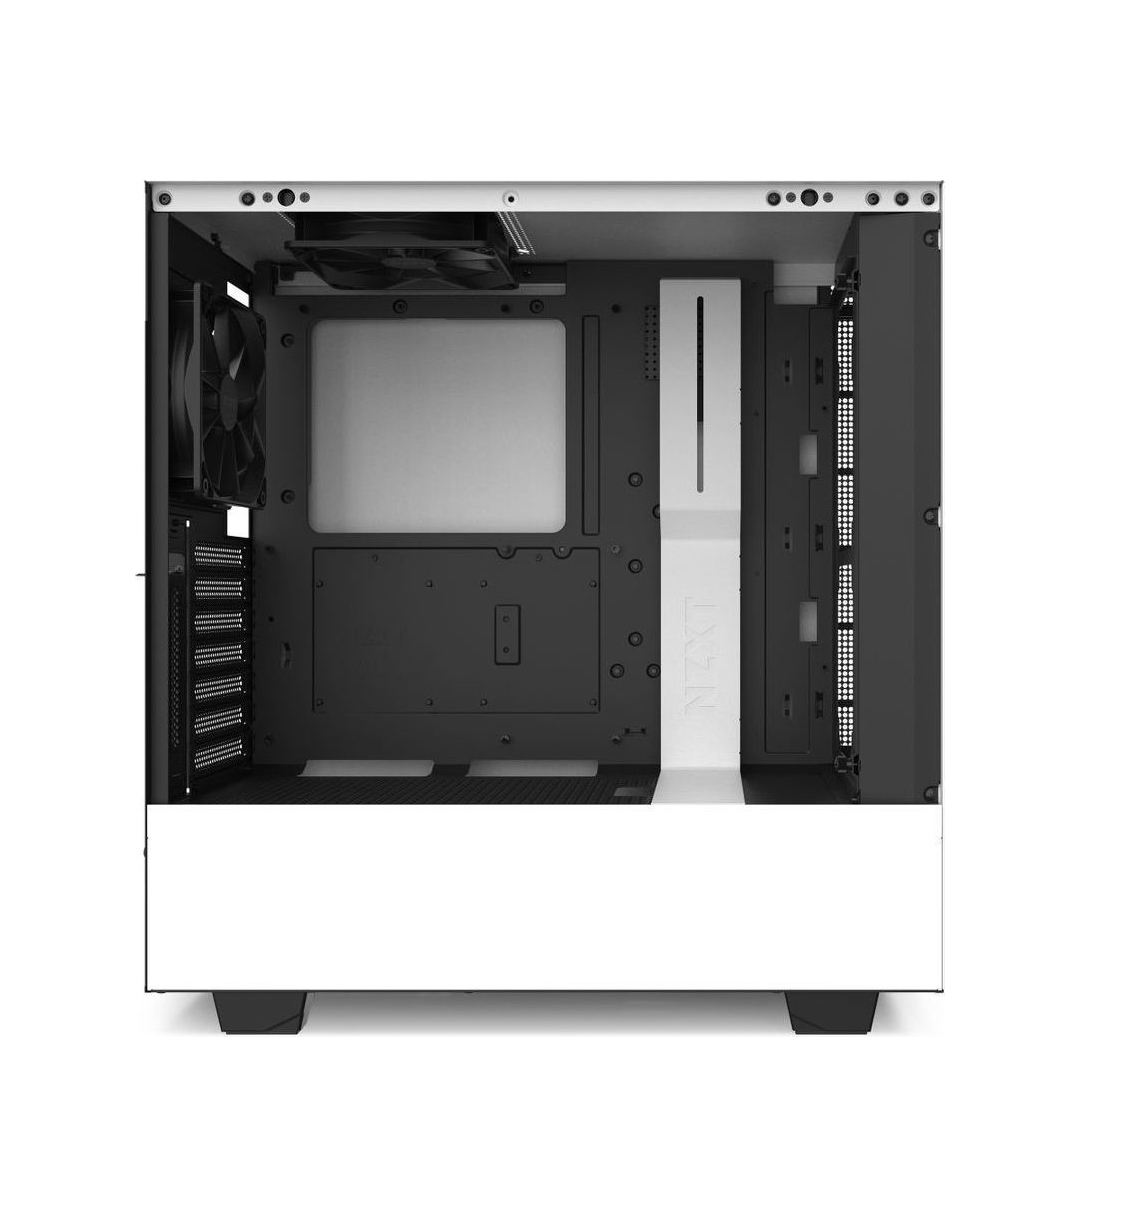 NZXT H510i Window Midi Tower CA-H510i-W1 White